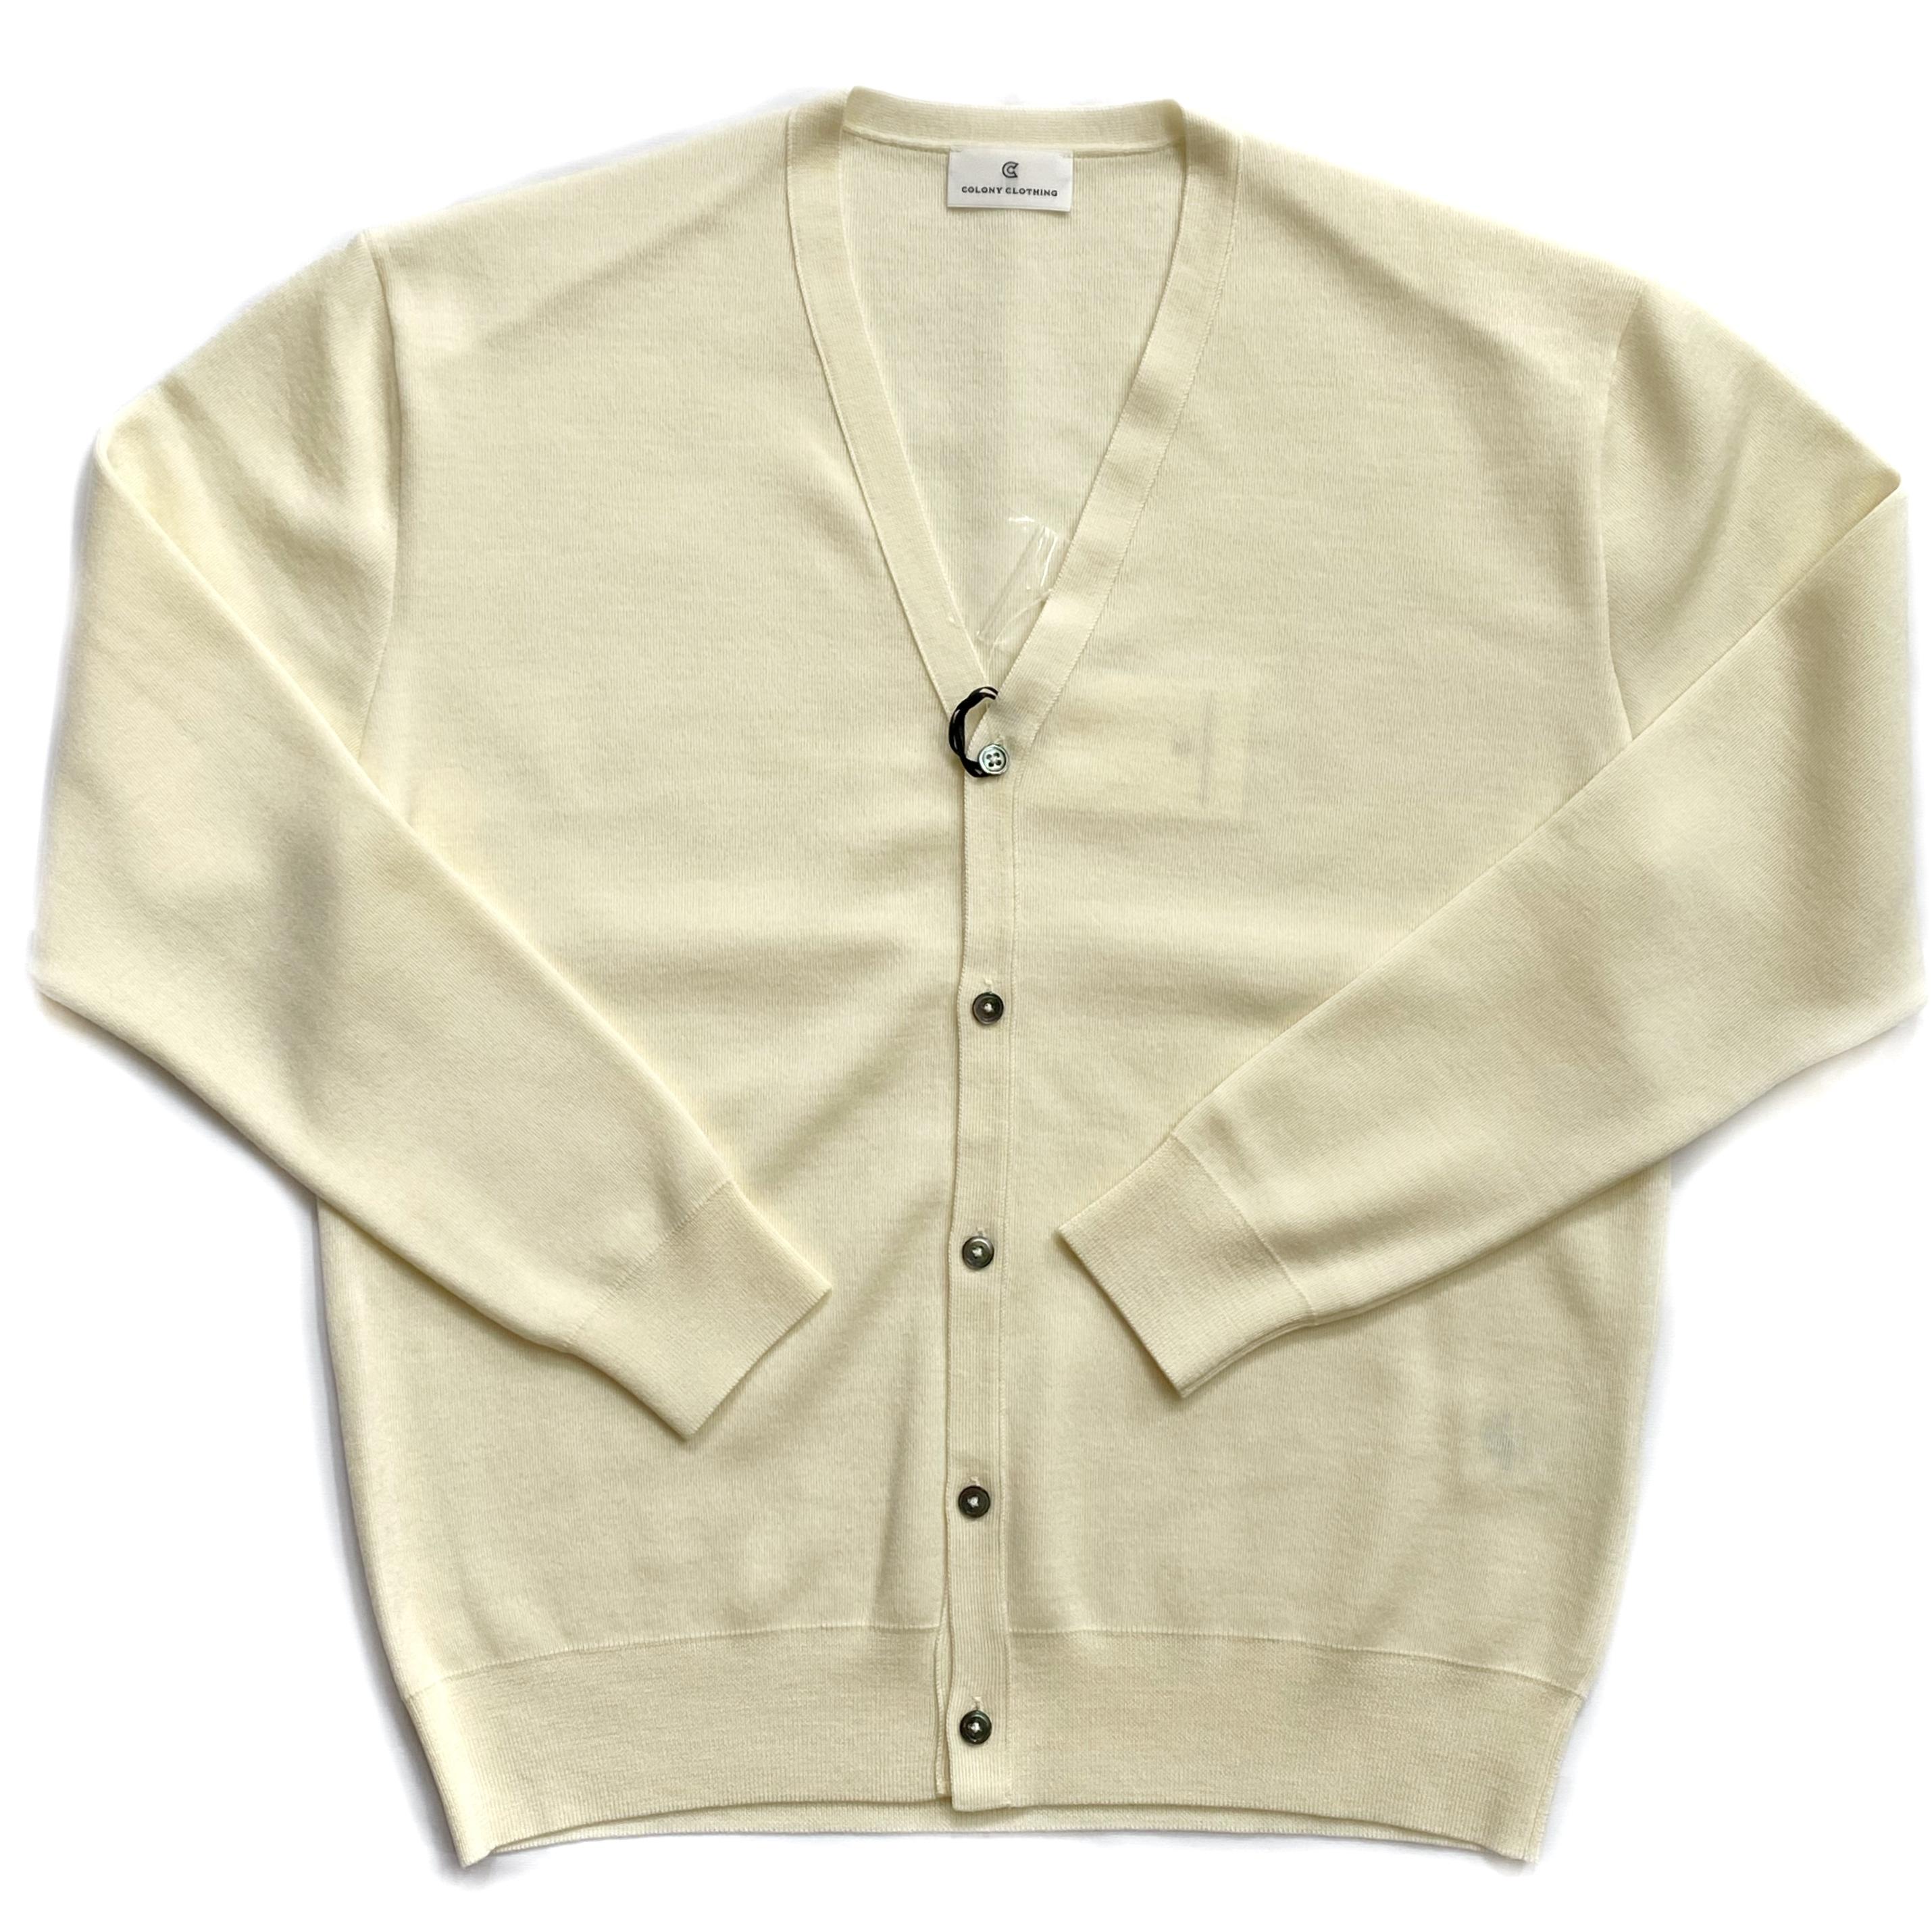 COLONY CLOTHING / Merino Wool Cardigan / CC21-2-KT02